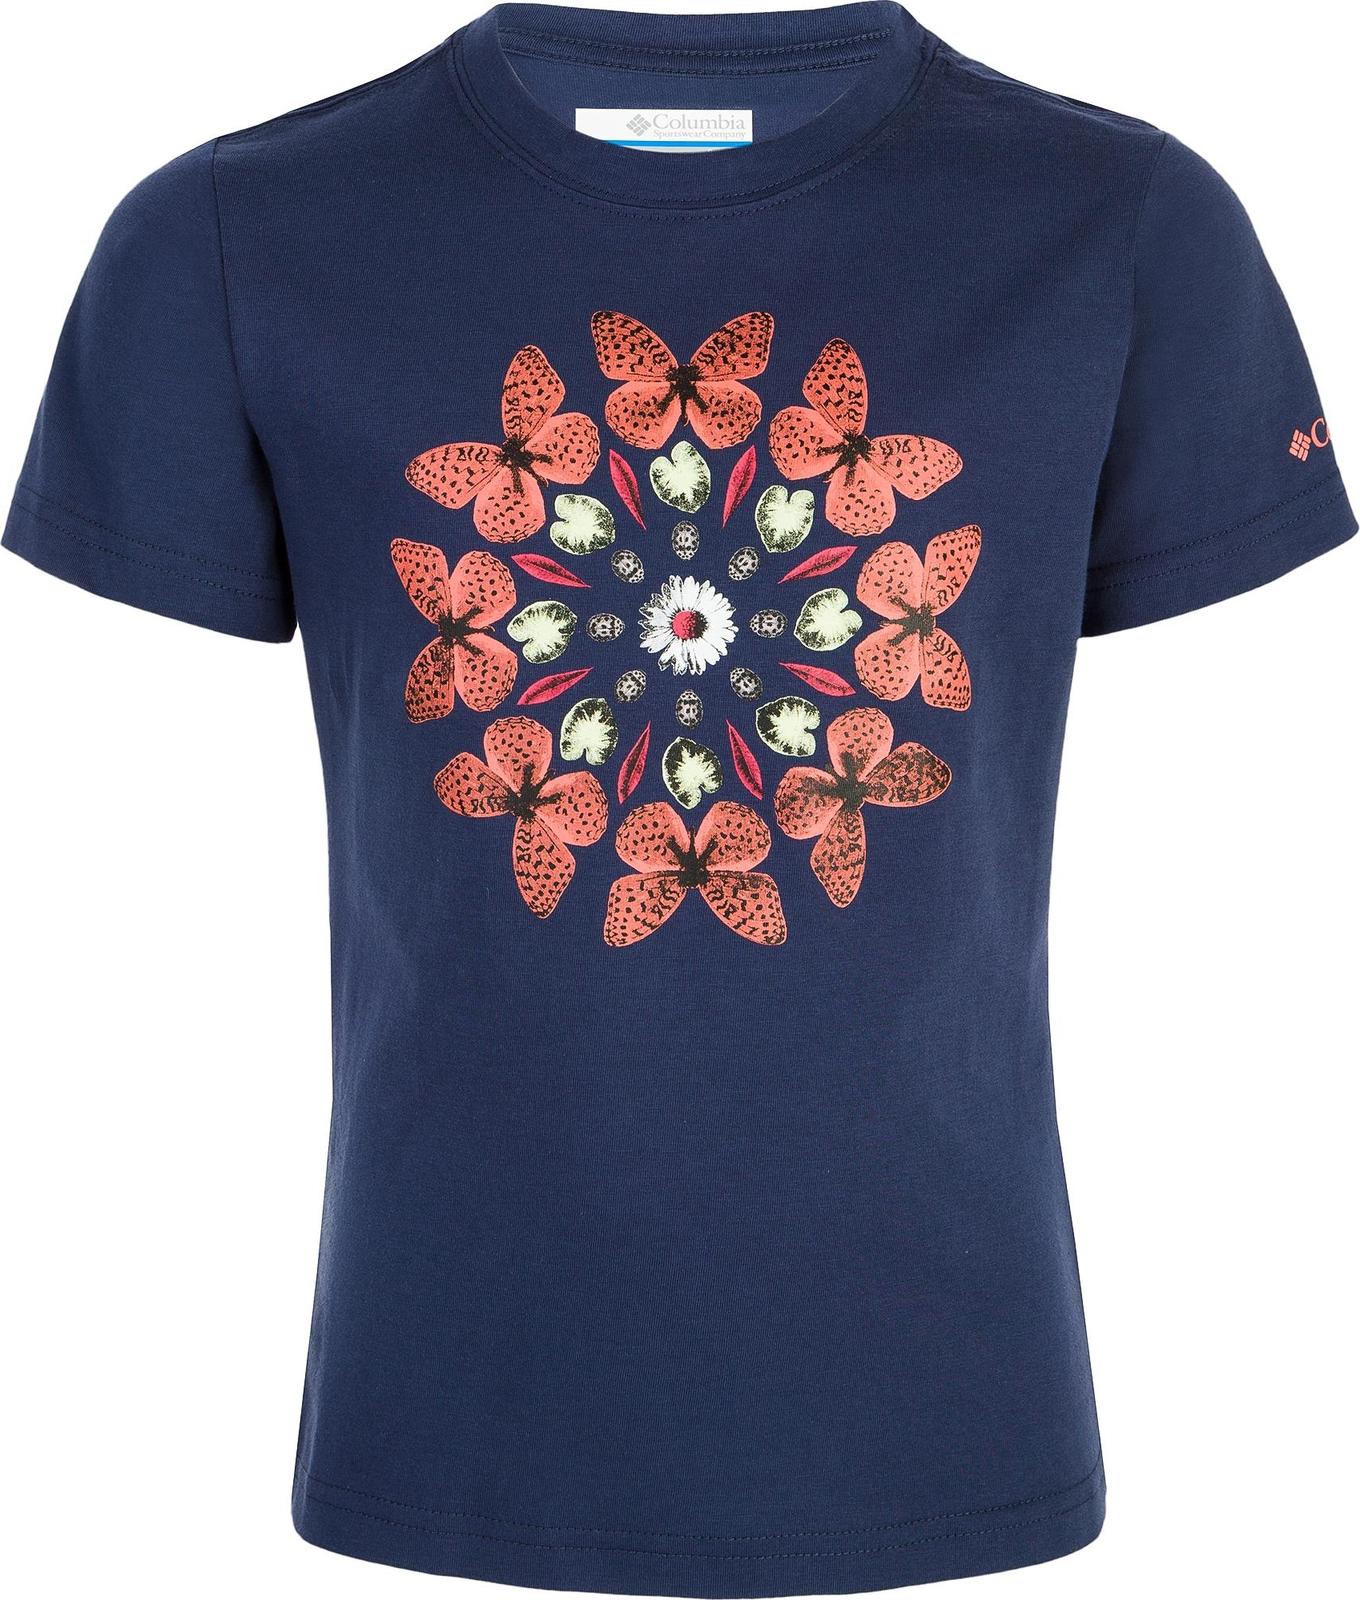 Футболка Columbia Wild Sky Short Sleeve Shirt roll tab sleeve shirt dress